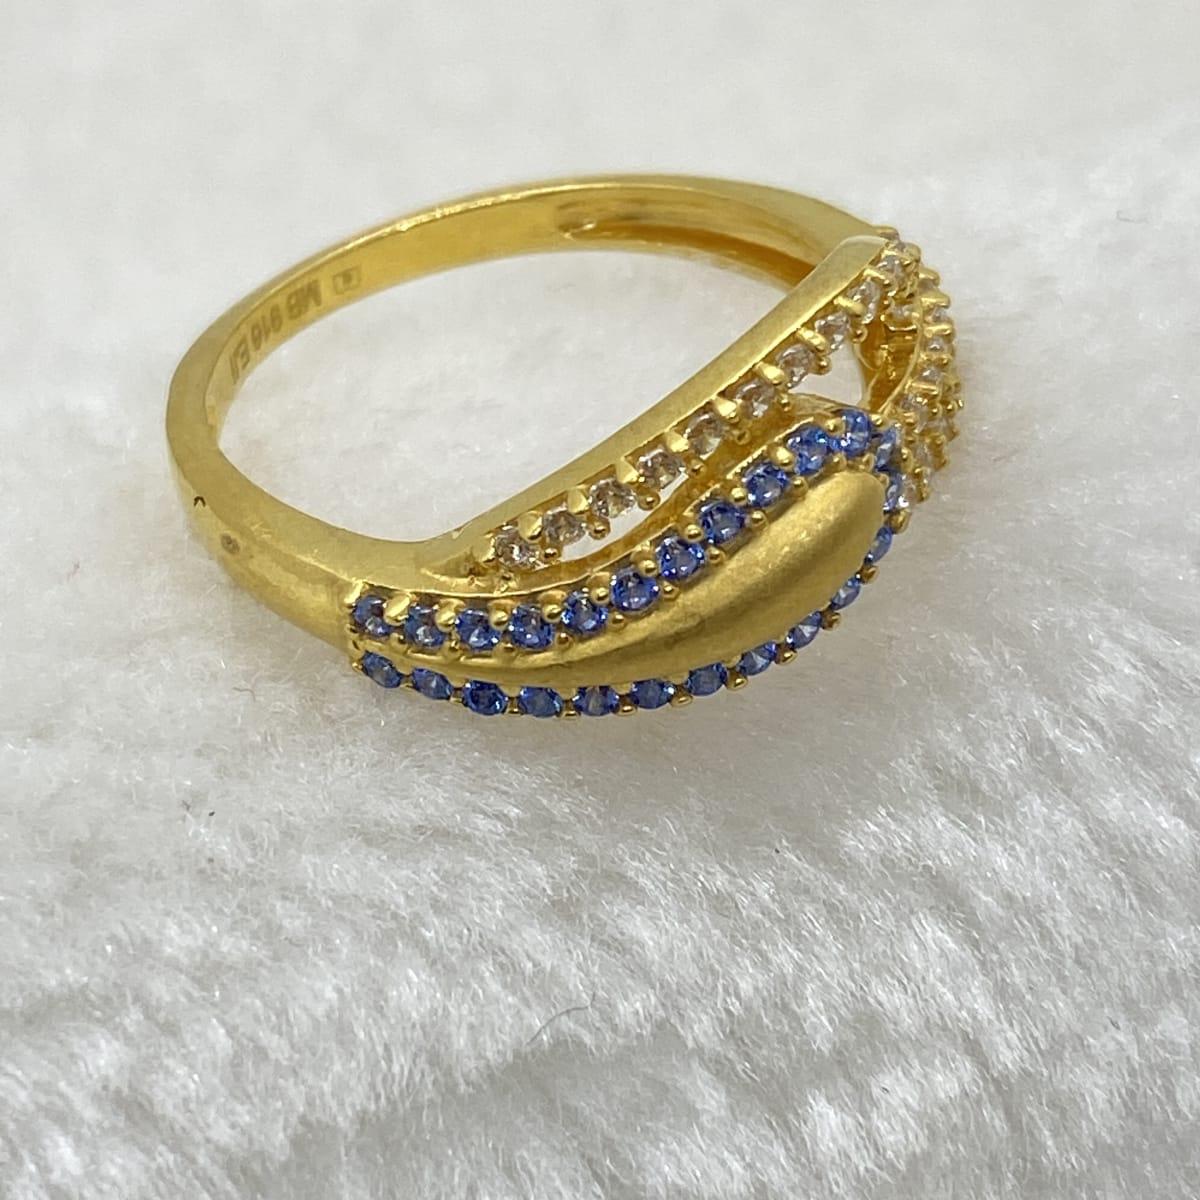 Fancy Ladies Casting Cz Ring Gj0139